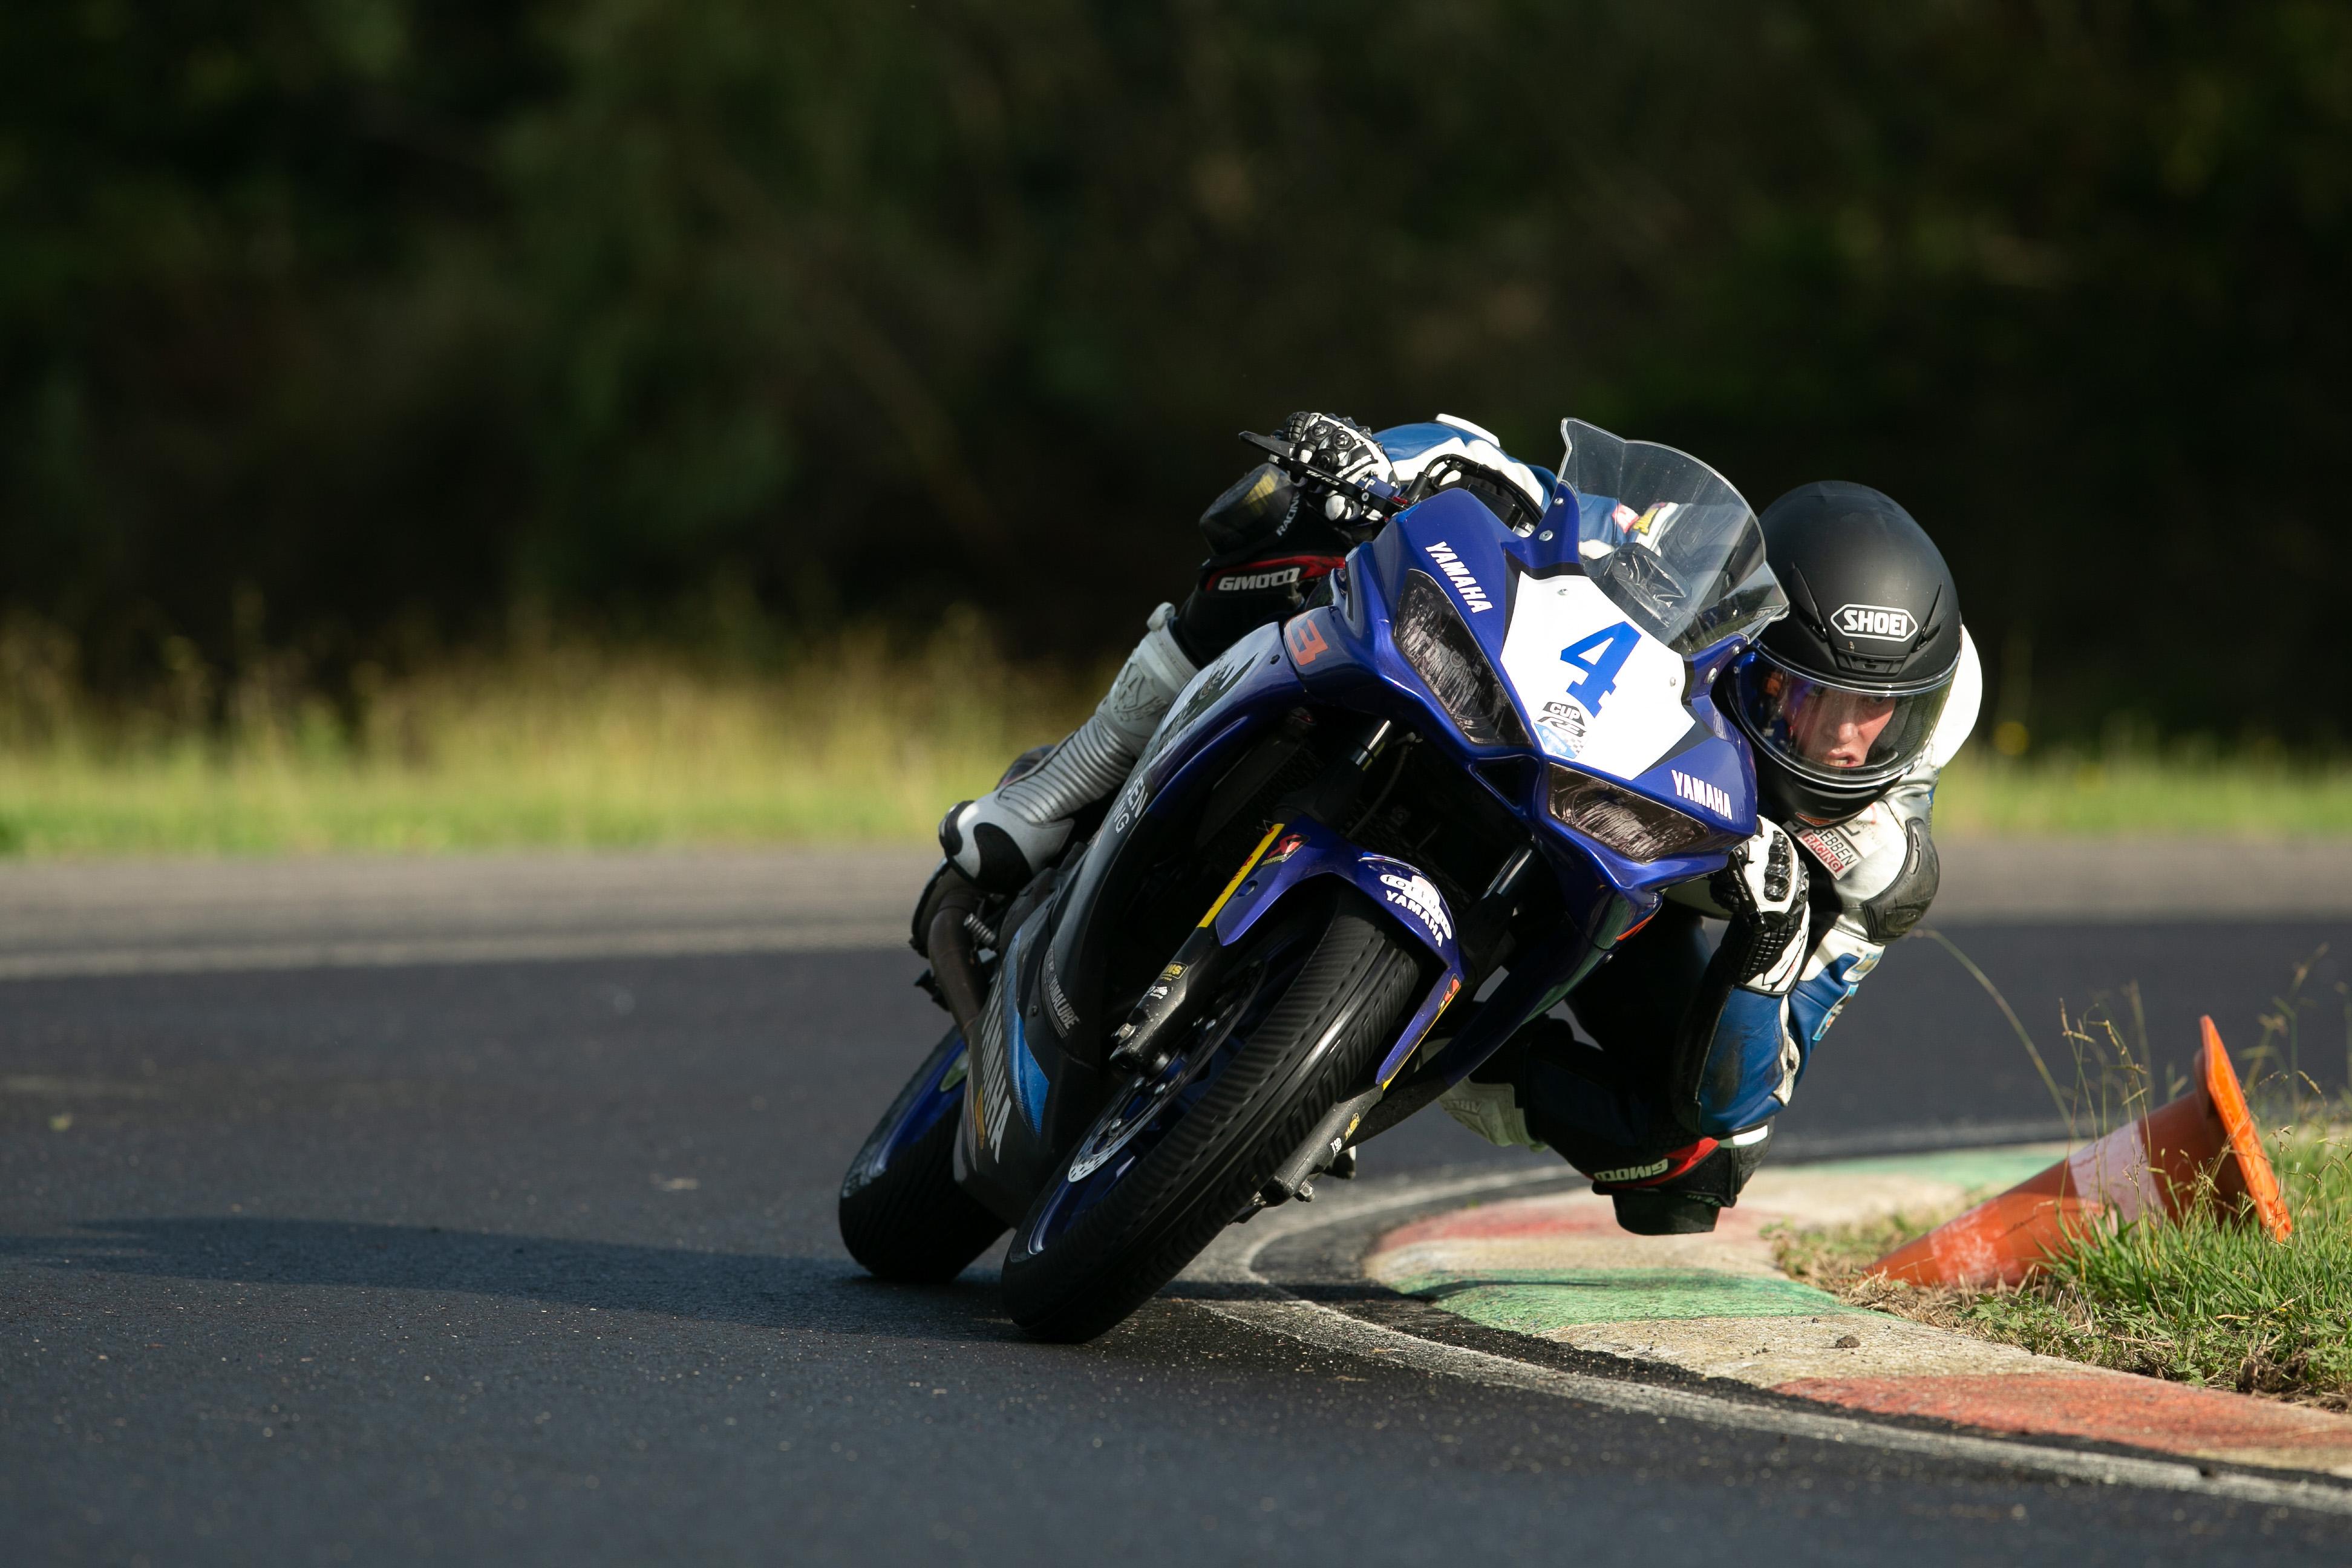 2019 Season WorldSSP300 Media gallery - Yamaha Racing